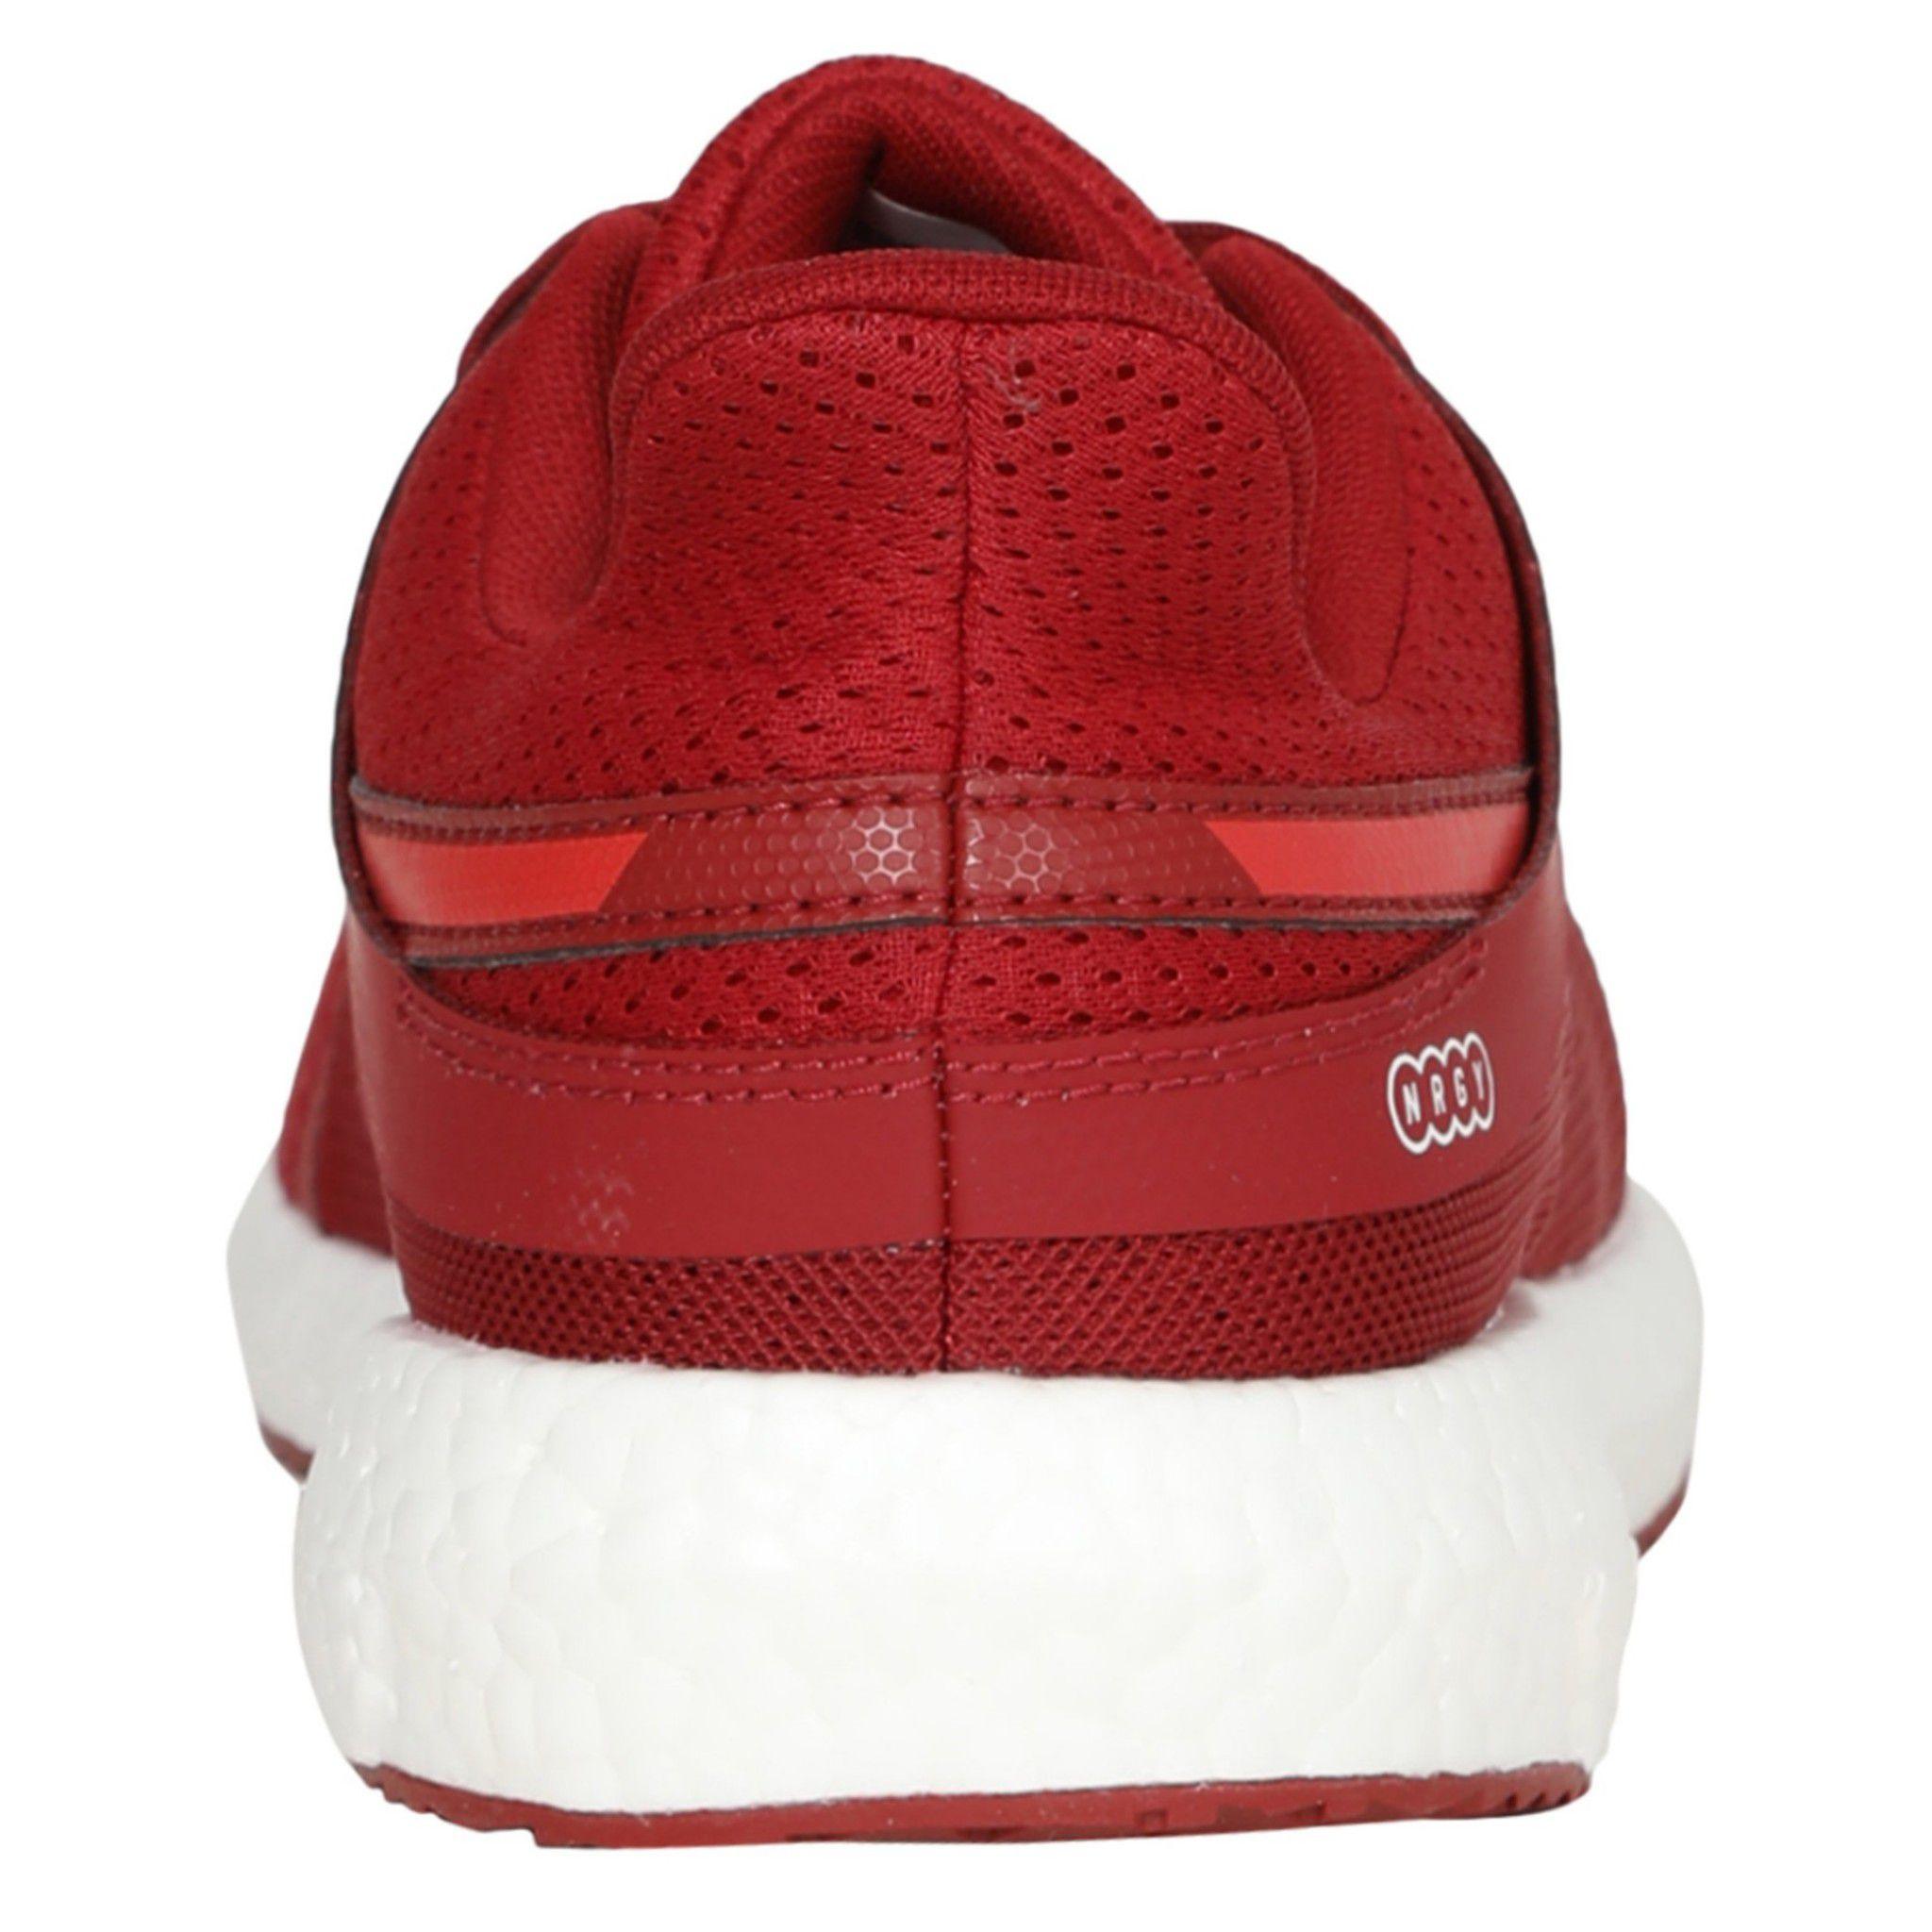 c5bd25fcac55 Puma Mega NRGY Turbo 2 Red Running Shoes - Buy Puma Mega NRGY Turbo ...